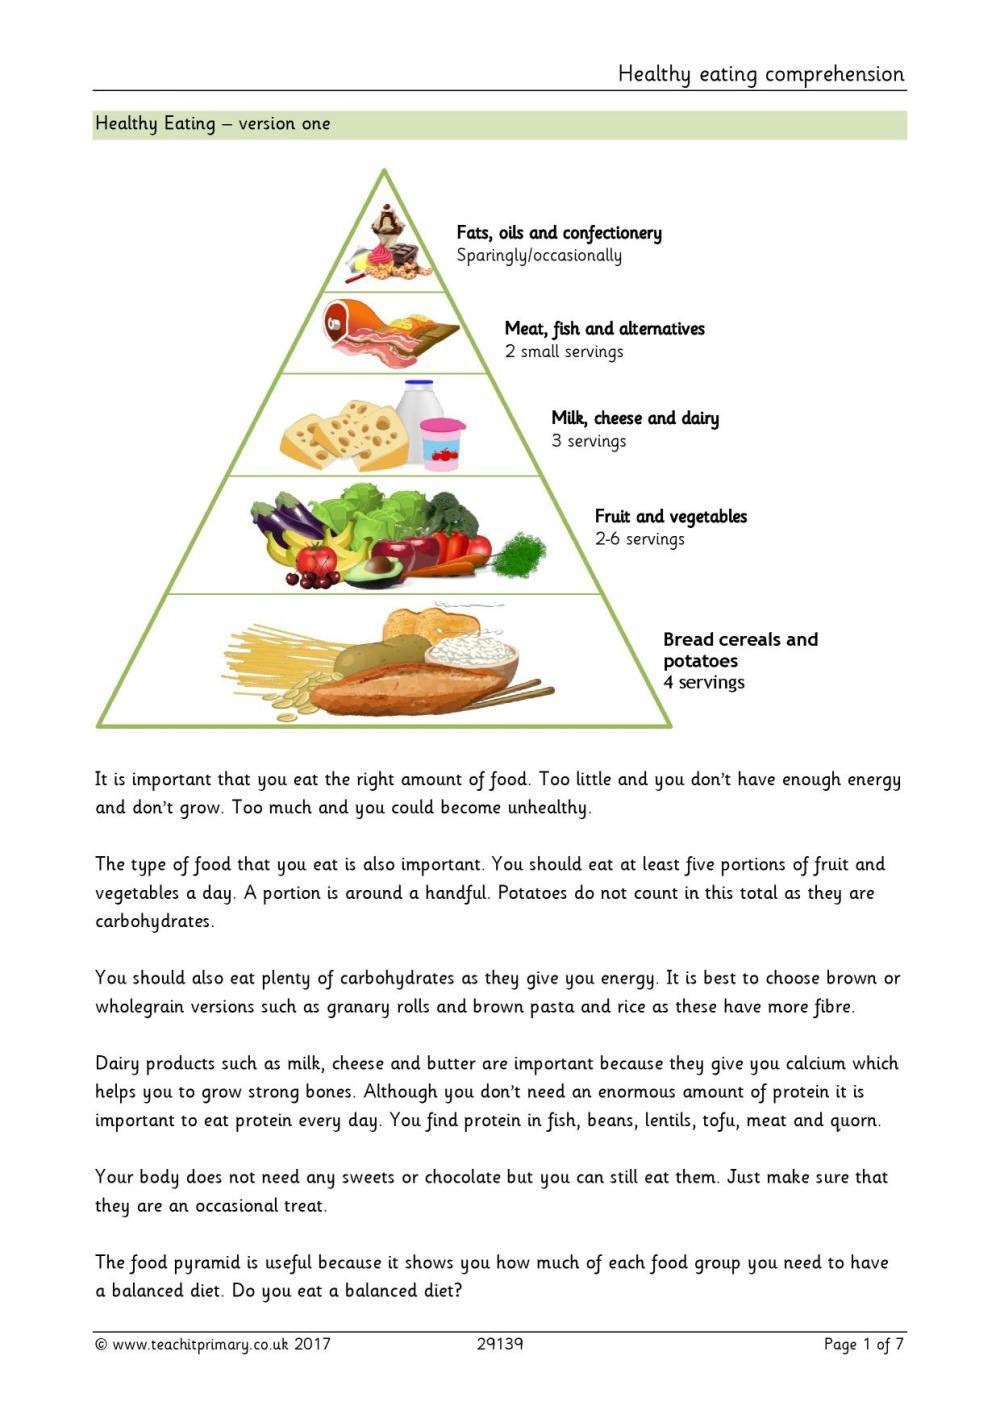 medium resolution of Healthy eating comprehension